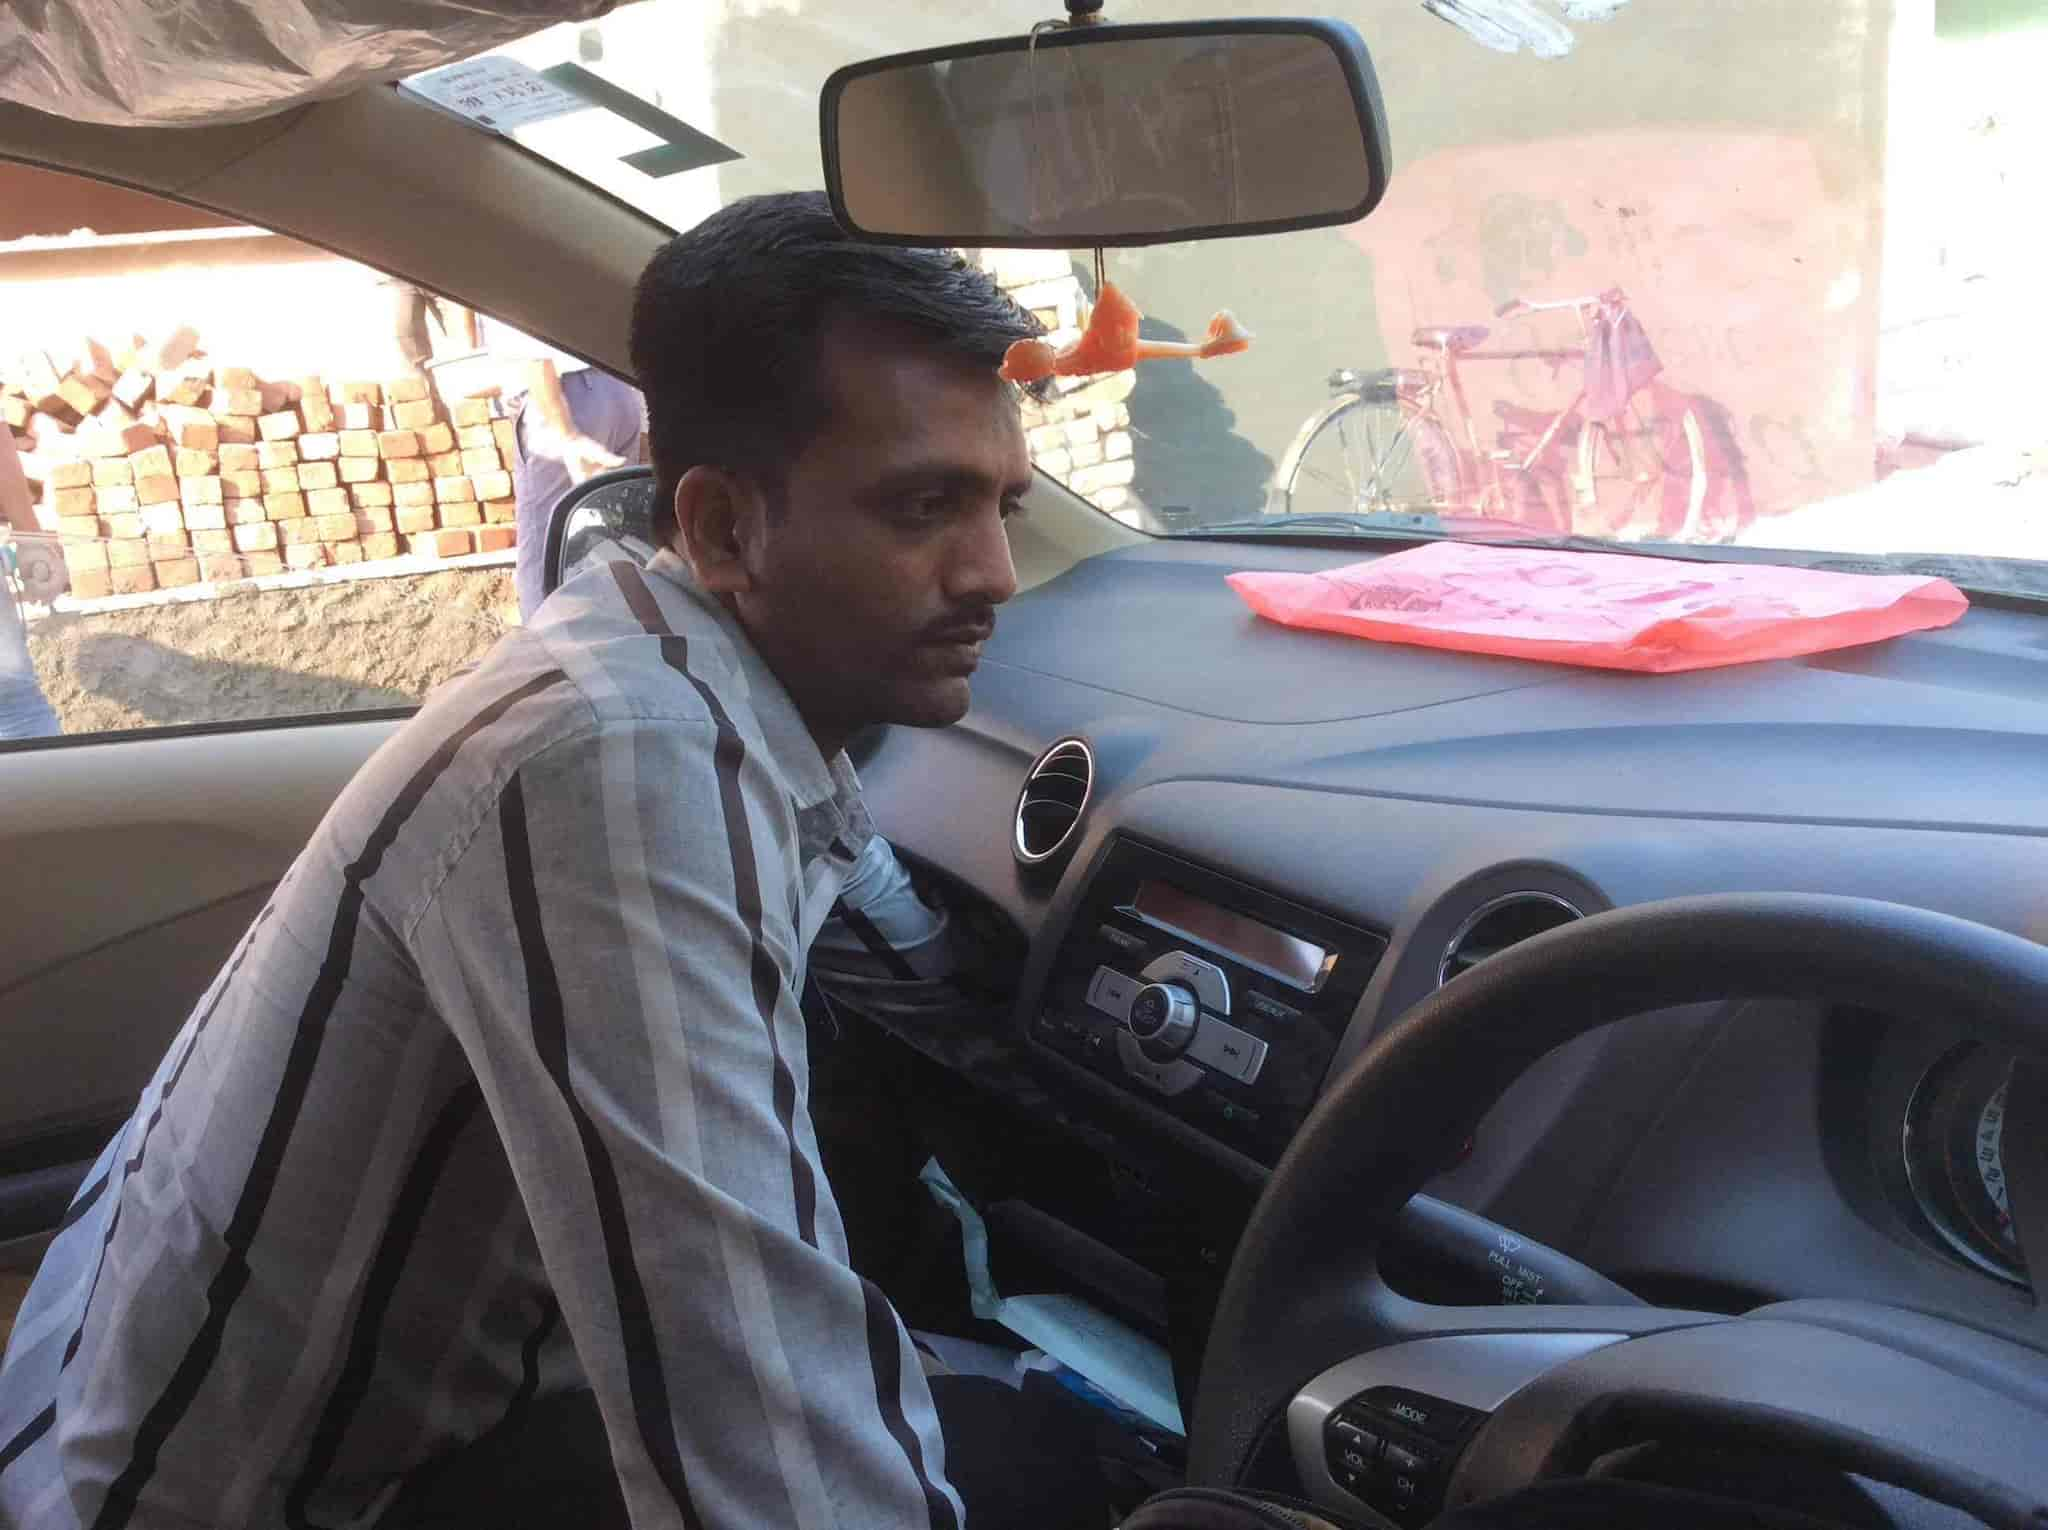 Ashraf Khan Auto Wiring Photos Bhavnagar Pictures Images Automotive Repair Car Services